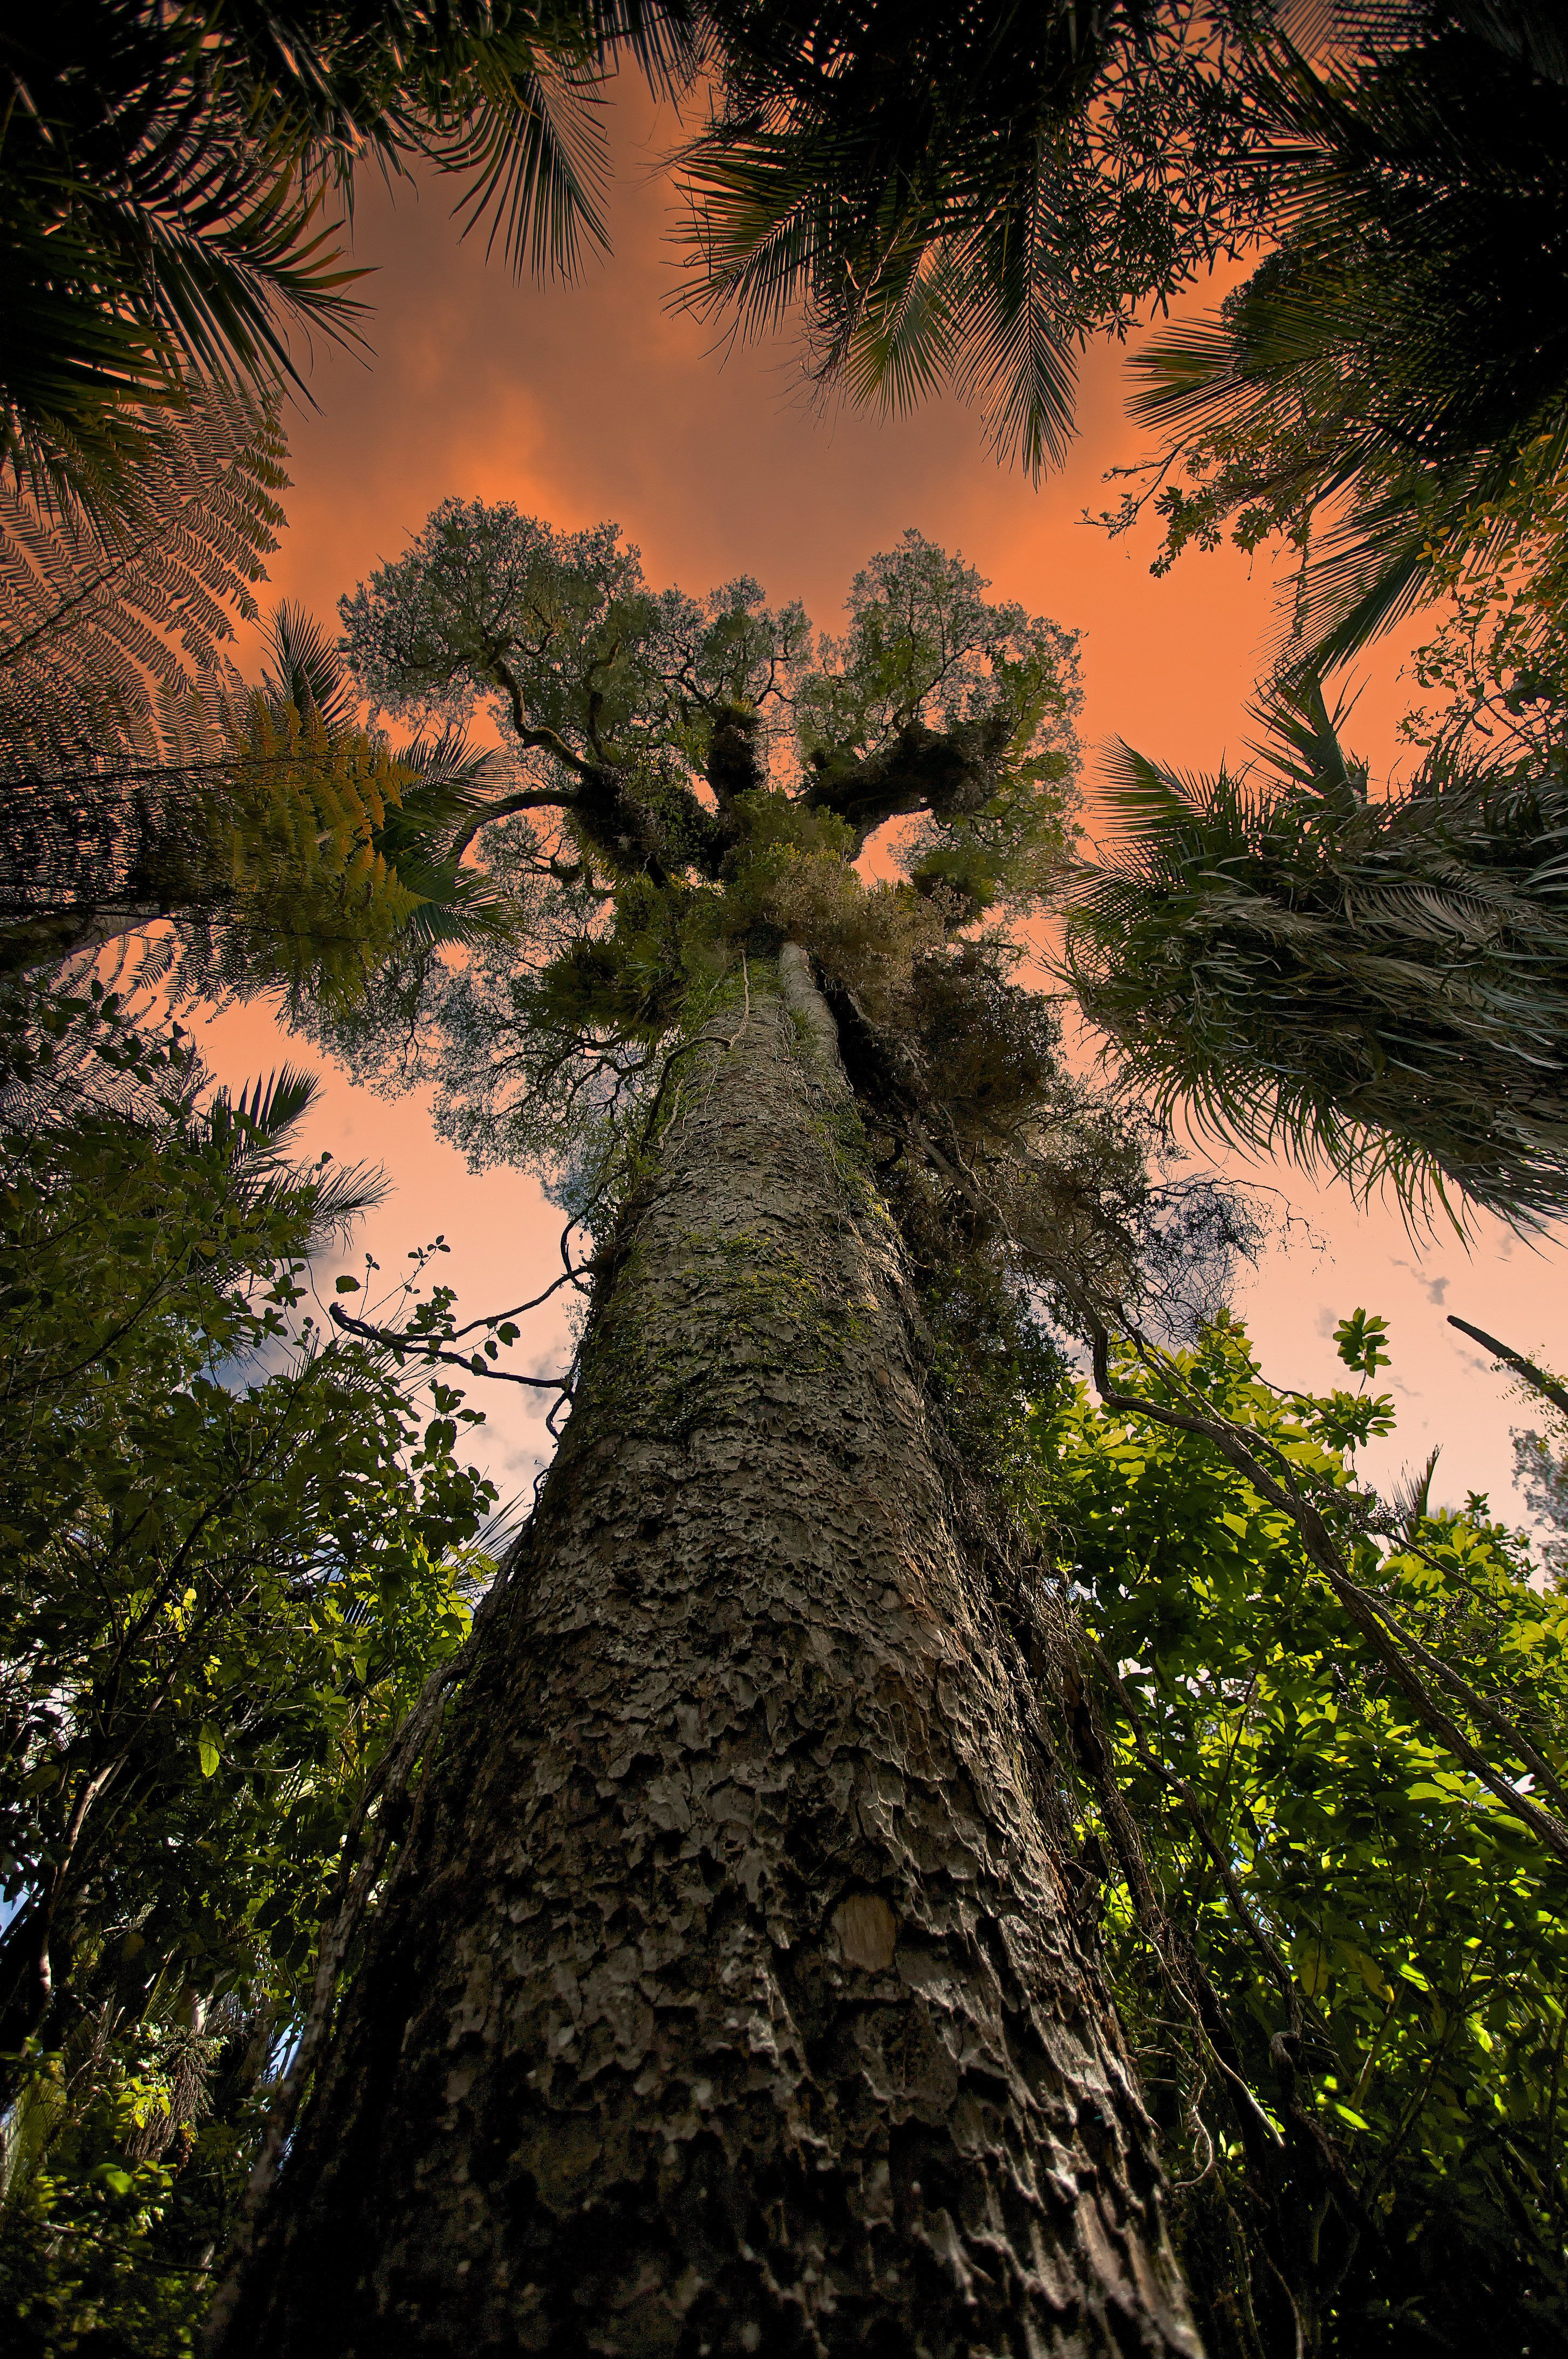 A Giant Kauri tree in Waitakere Ranges Regional Park near Auckland, New Zealand.